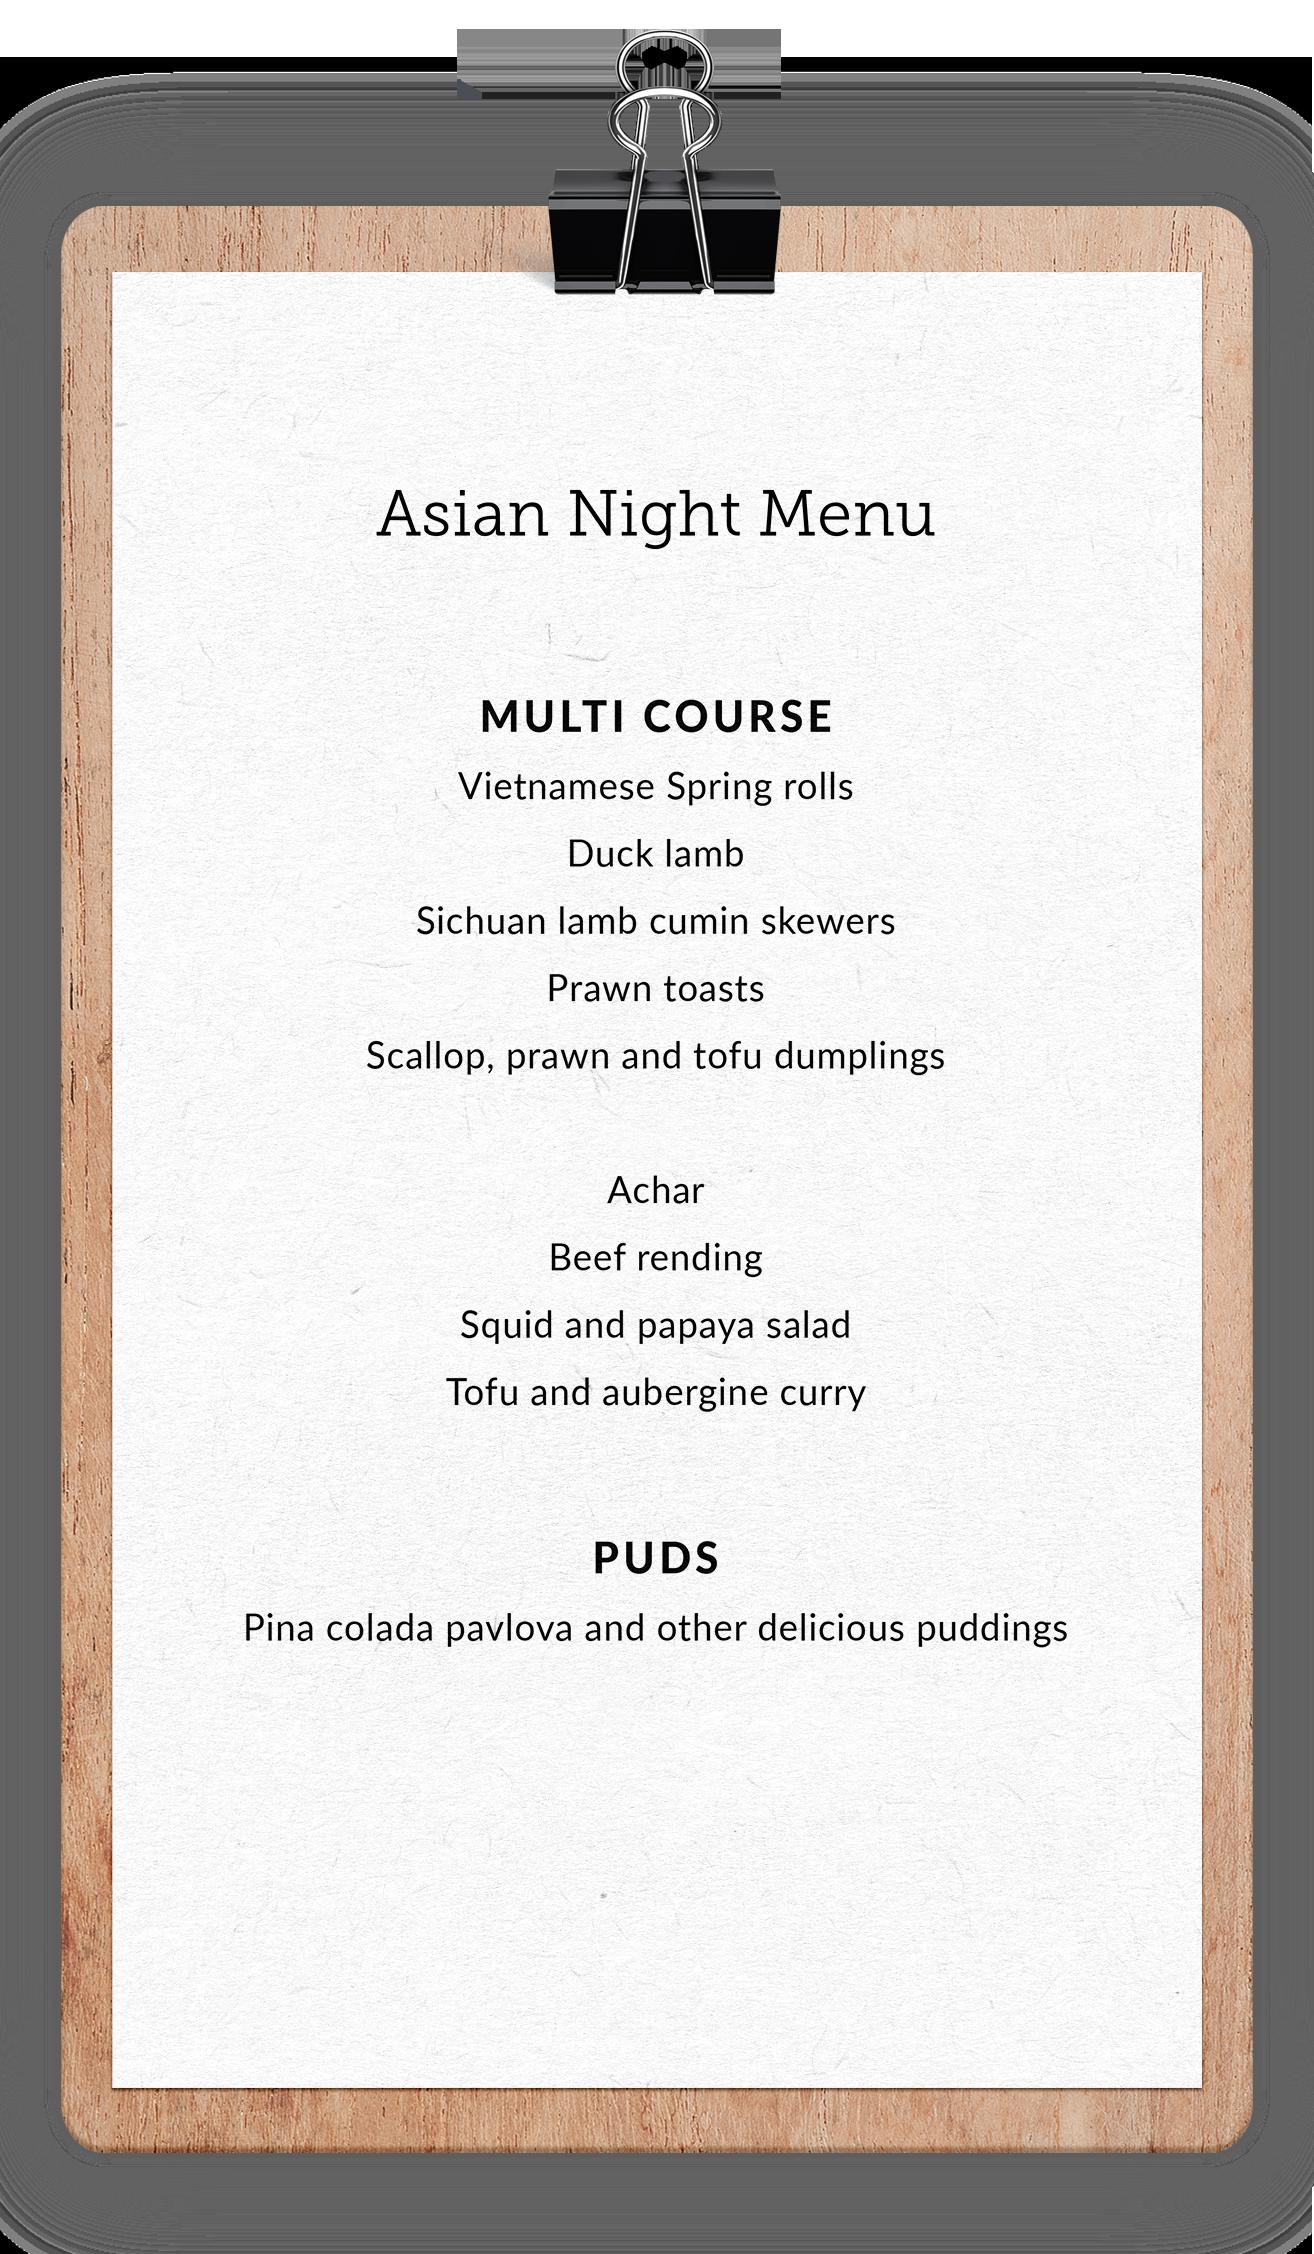 AsianNight-Menu.png